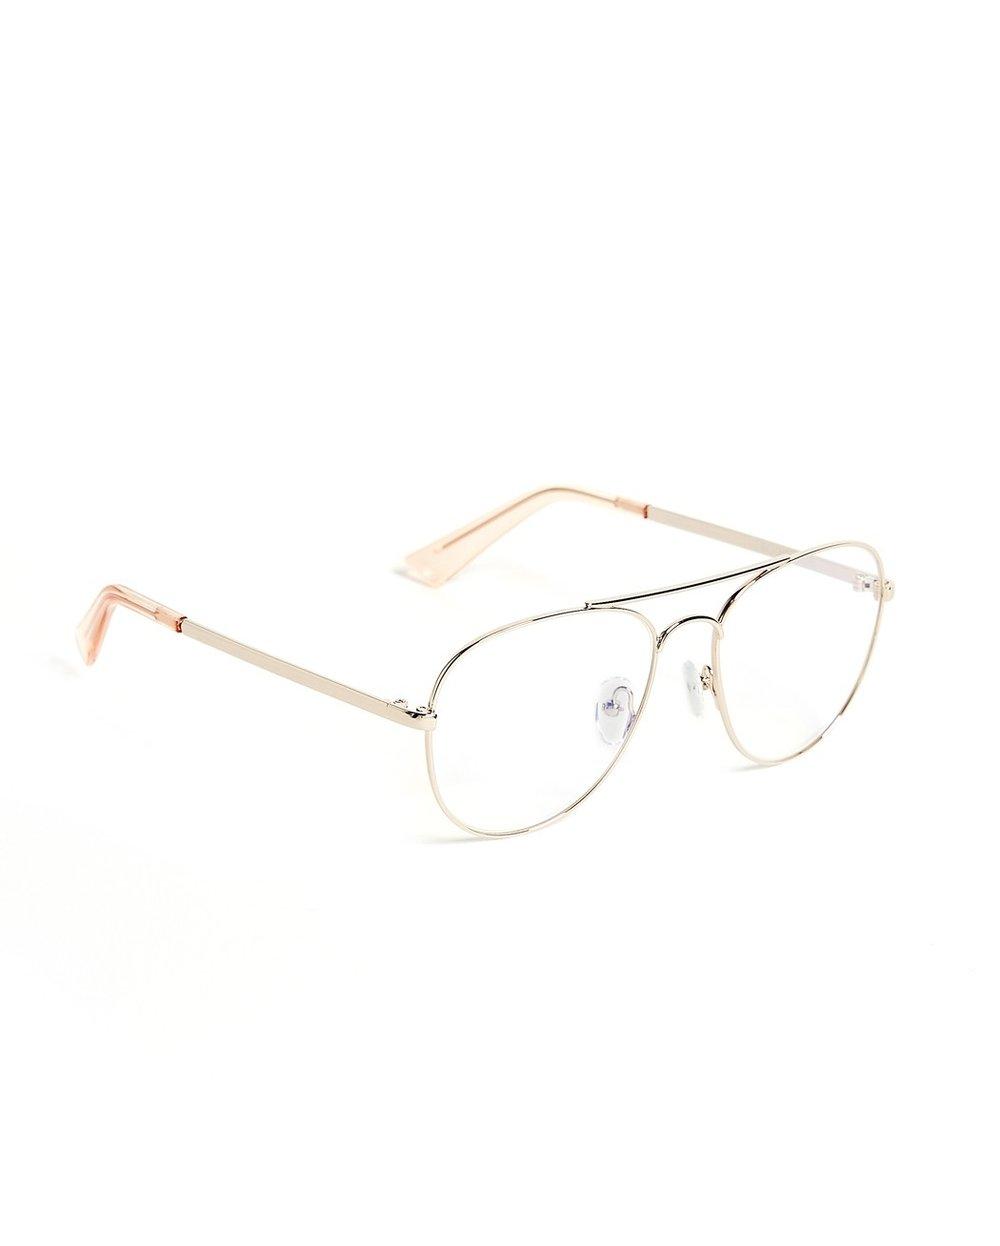 The Book Club Aviator Glasses